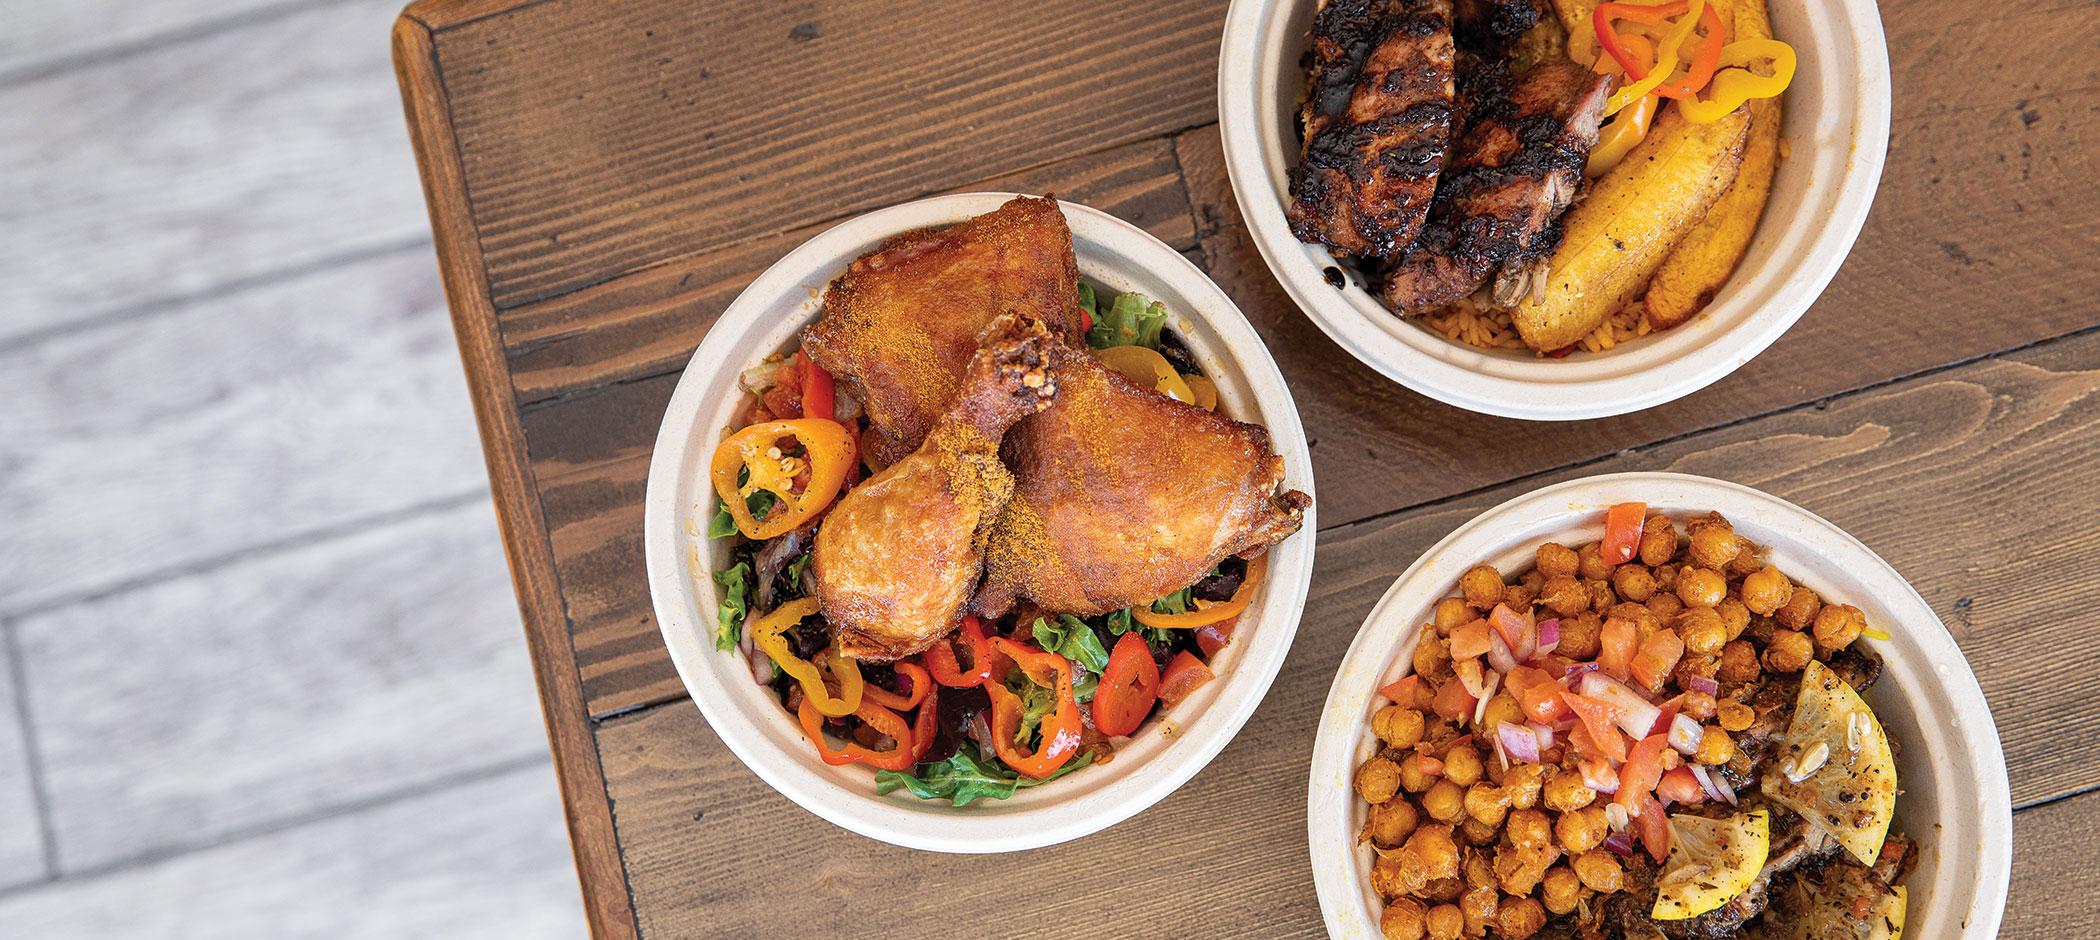 Guide To New Detroit Restaurants Fall 2019 Visitdetroit Com